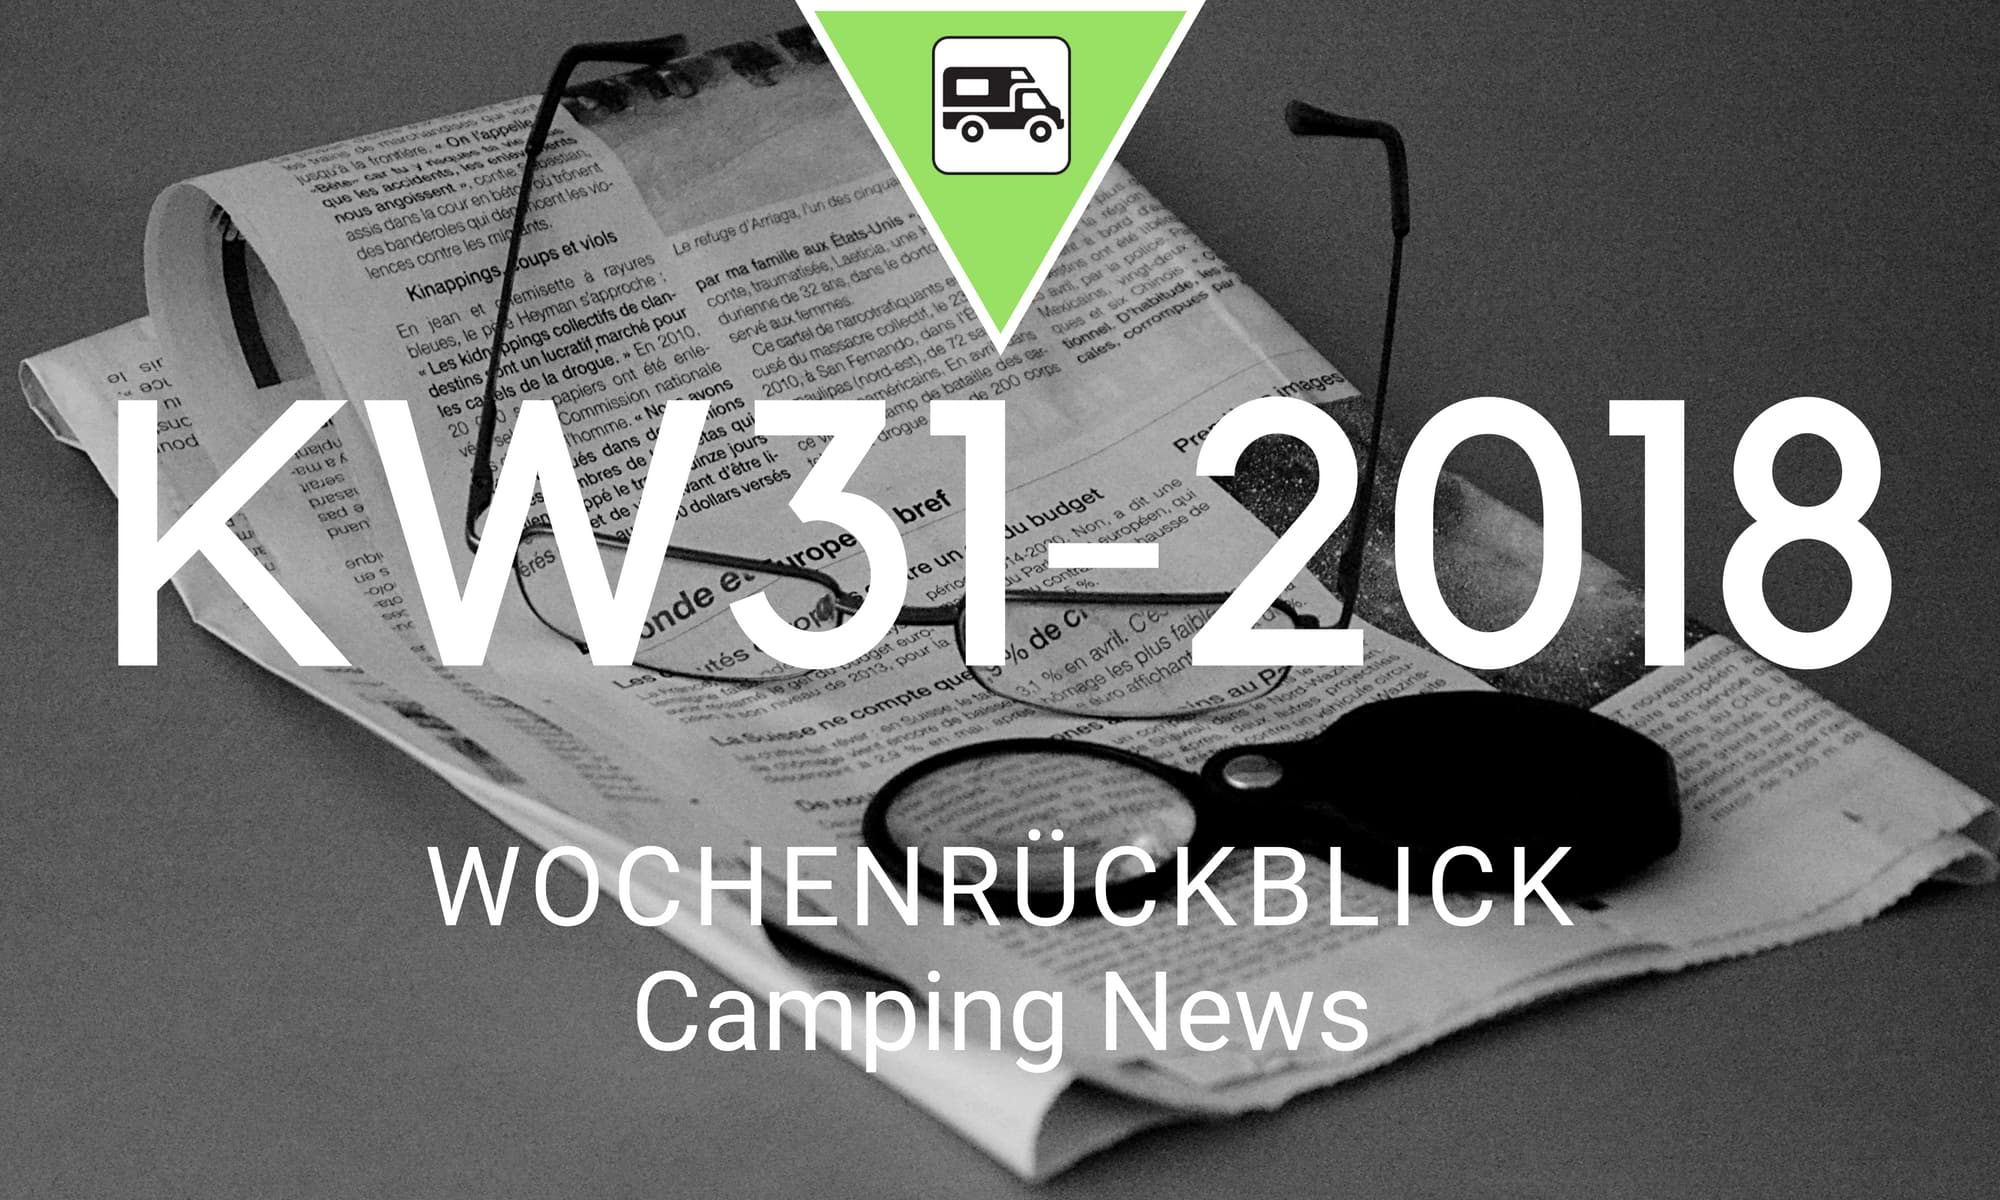 Wochenrückblick Camping News KW31-2018